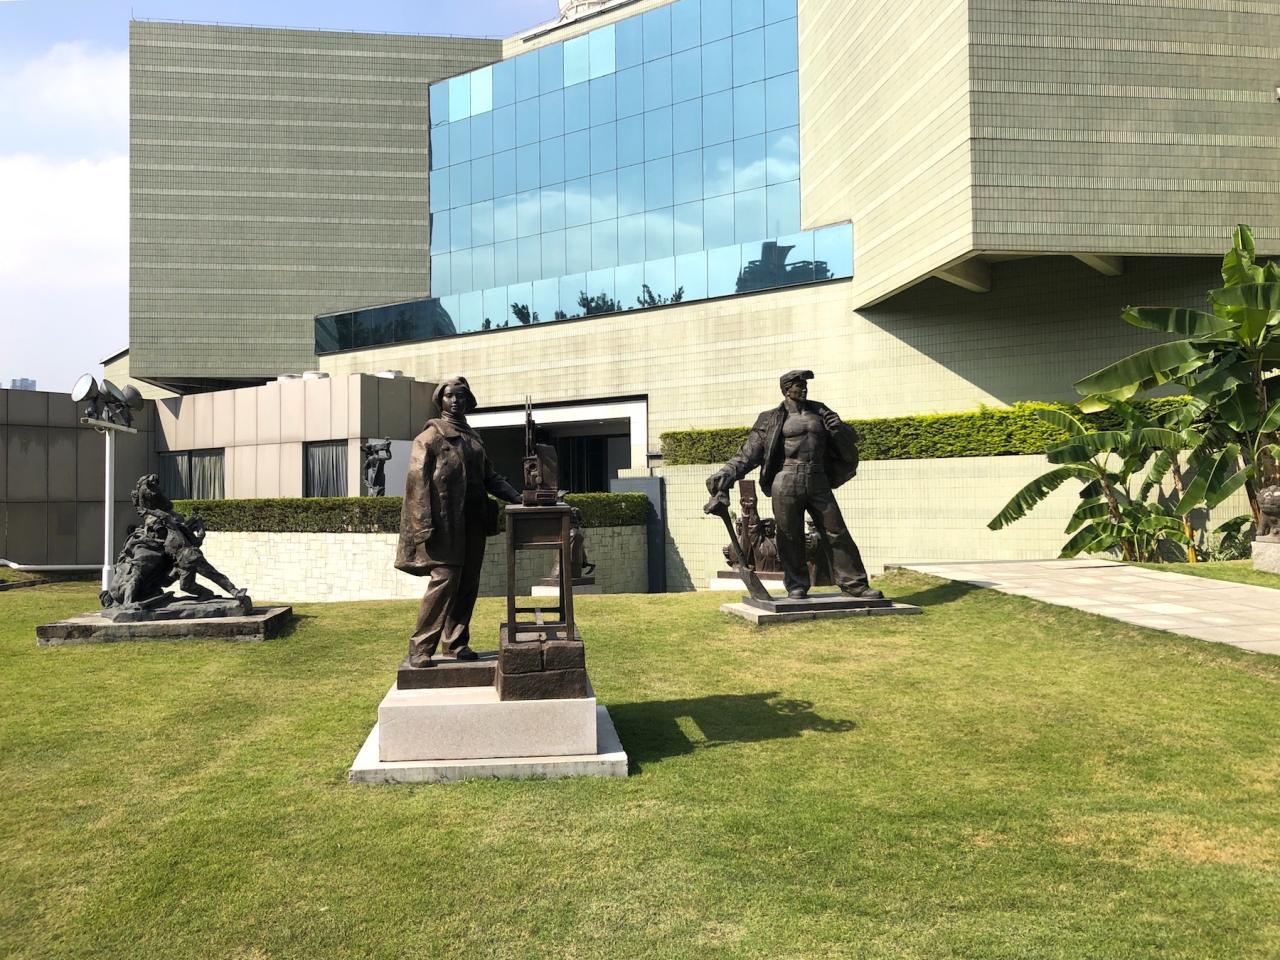 Guangdong museum and garden